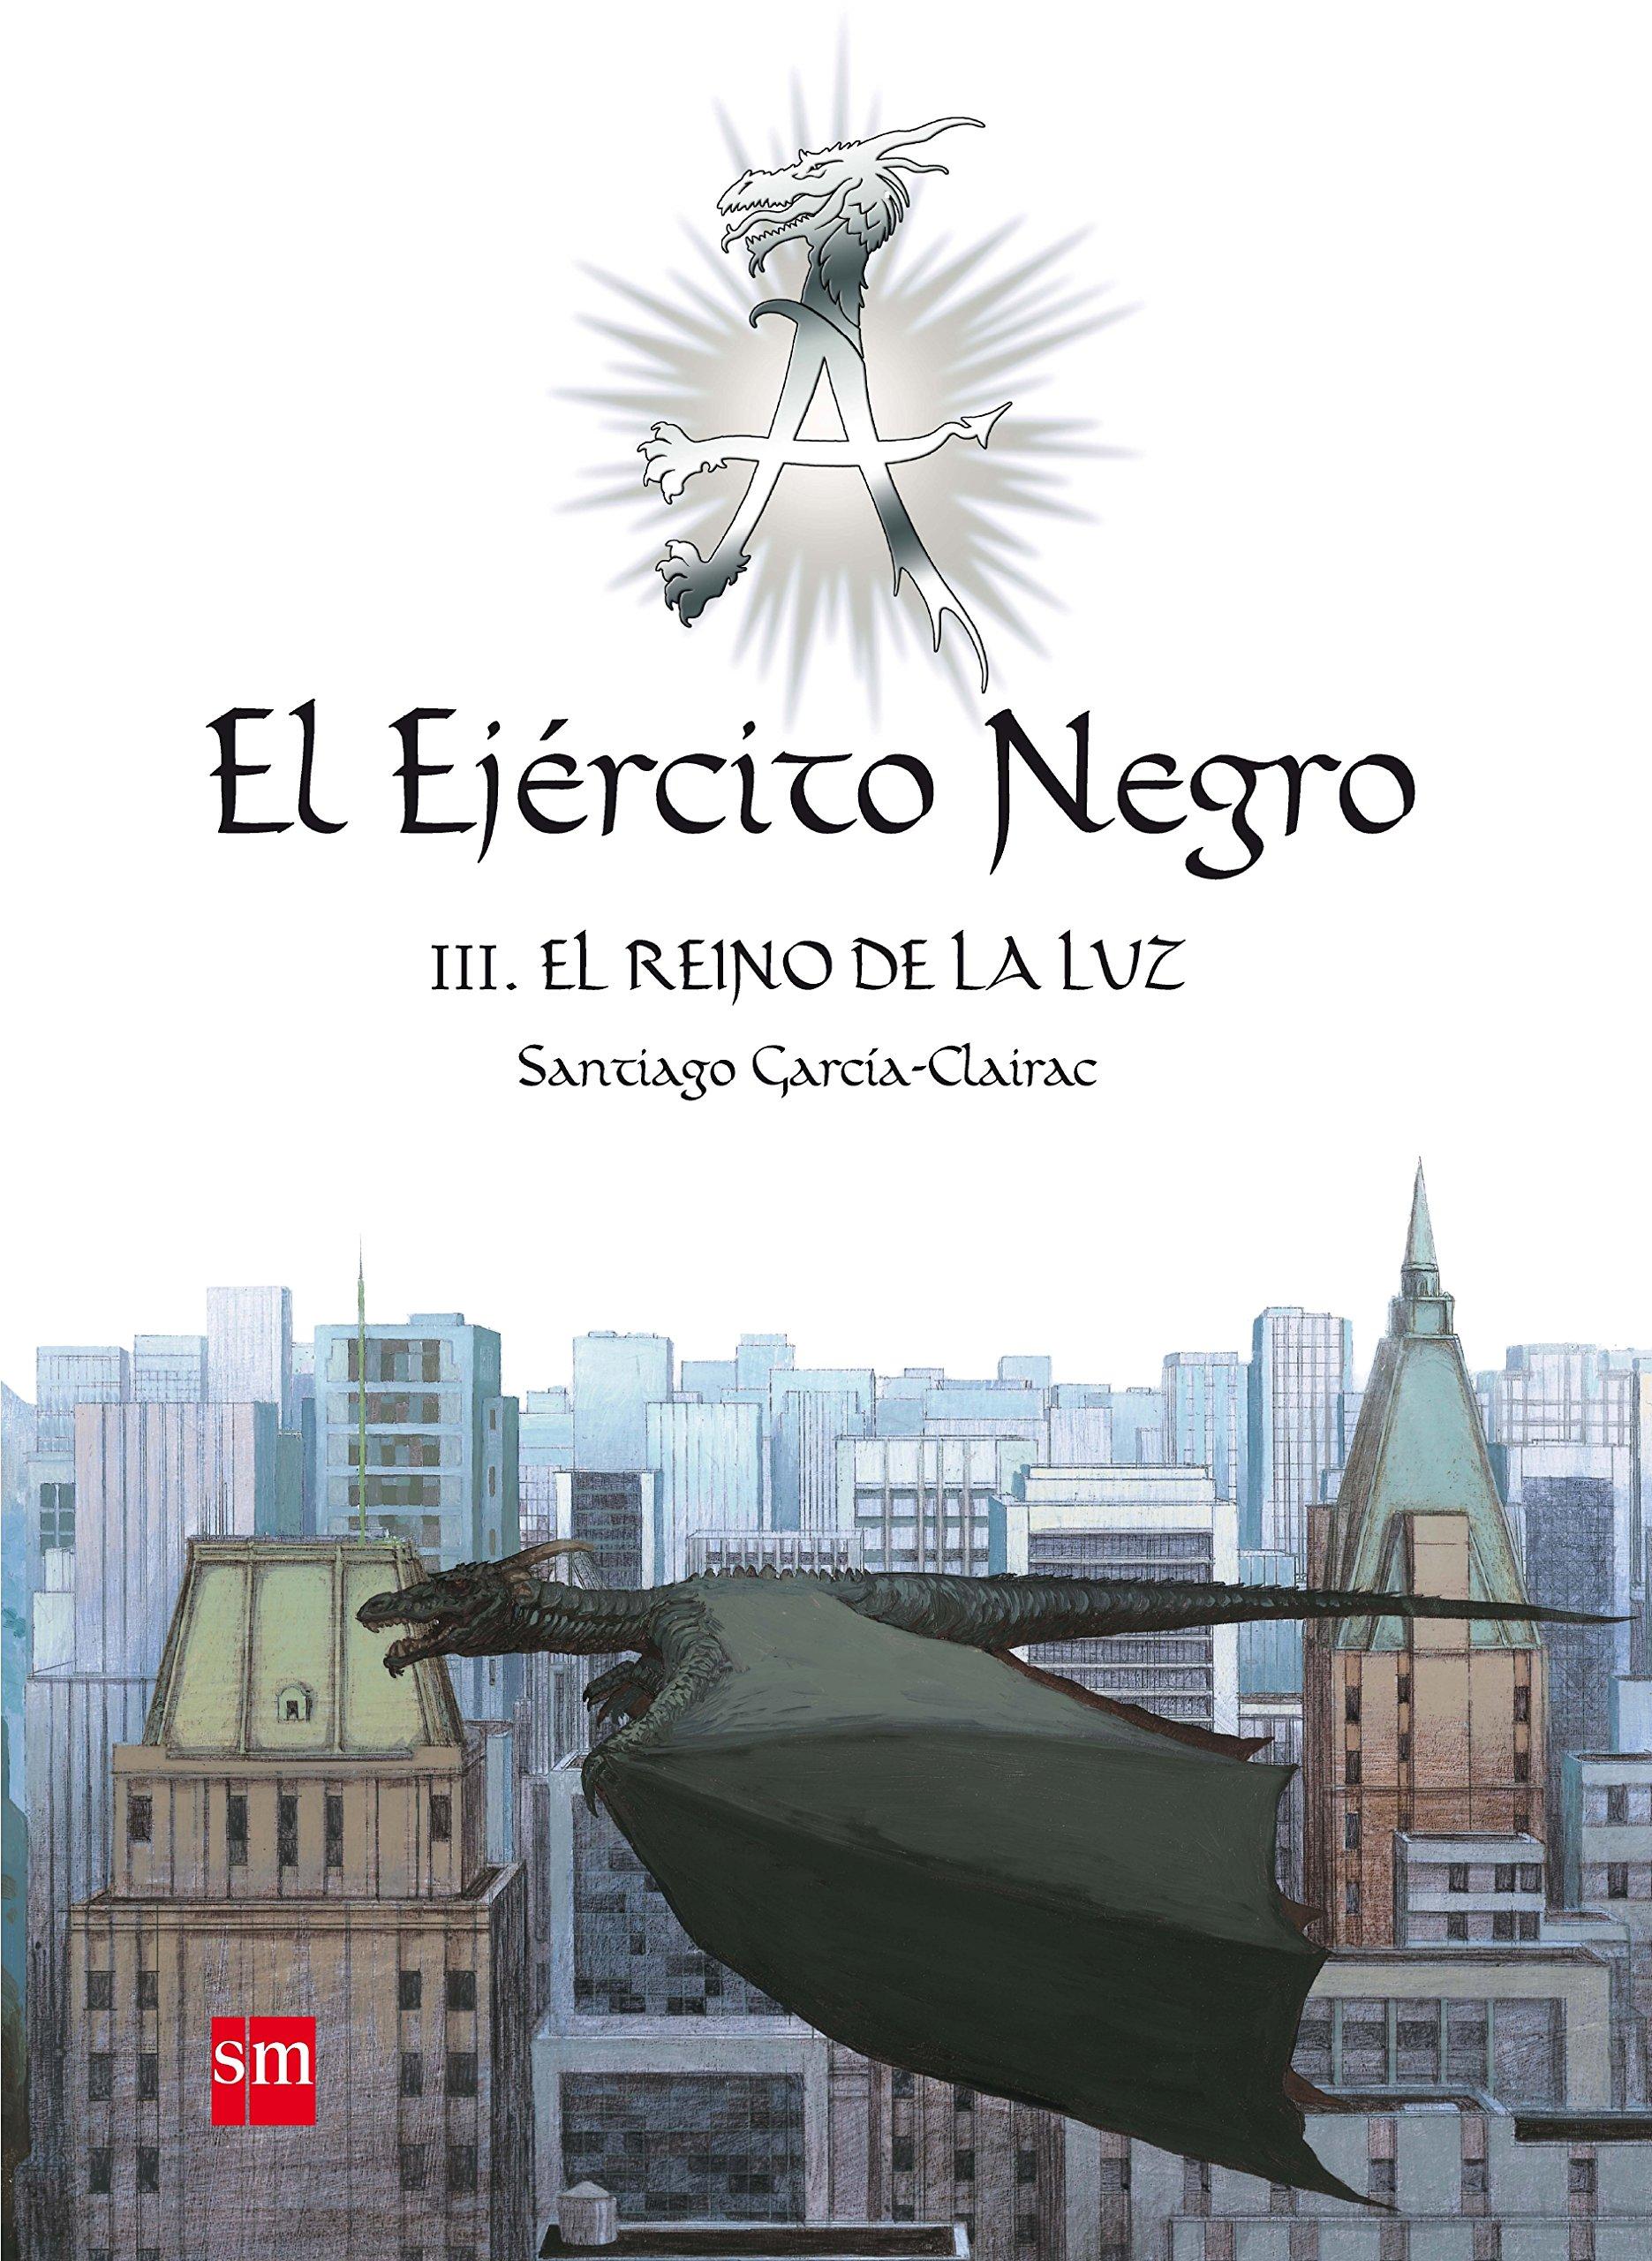 El ejercito negro / The Black Army: El reino de la luz / Light's Kingdom (Spanish Edition) pdf epub